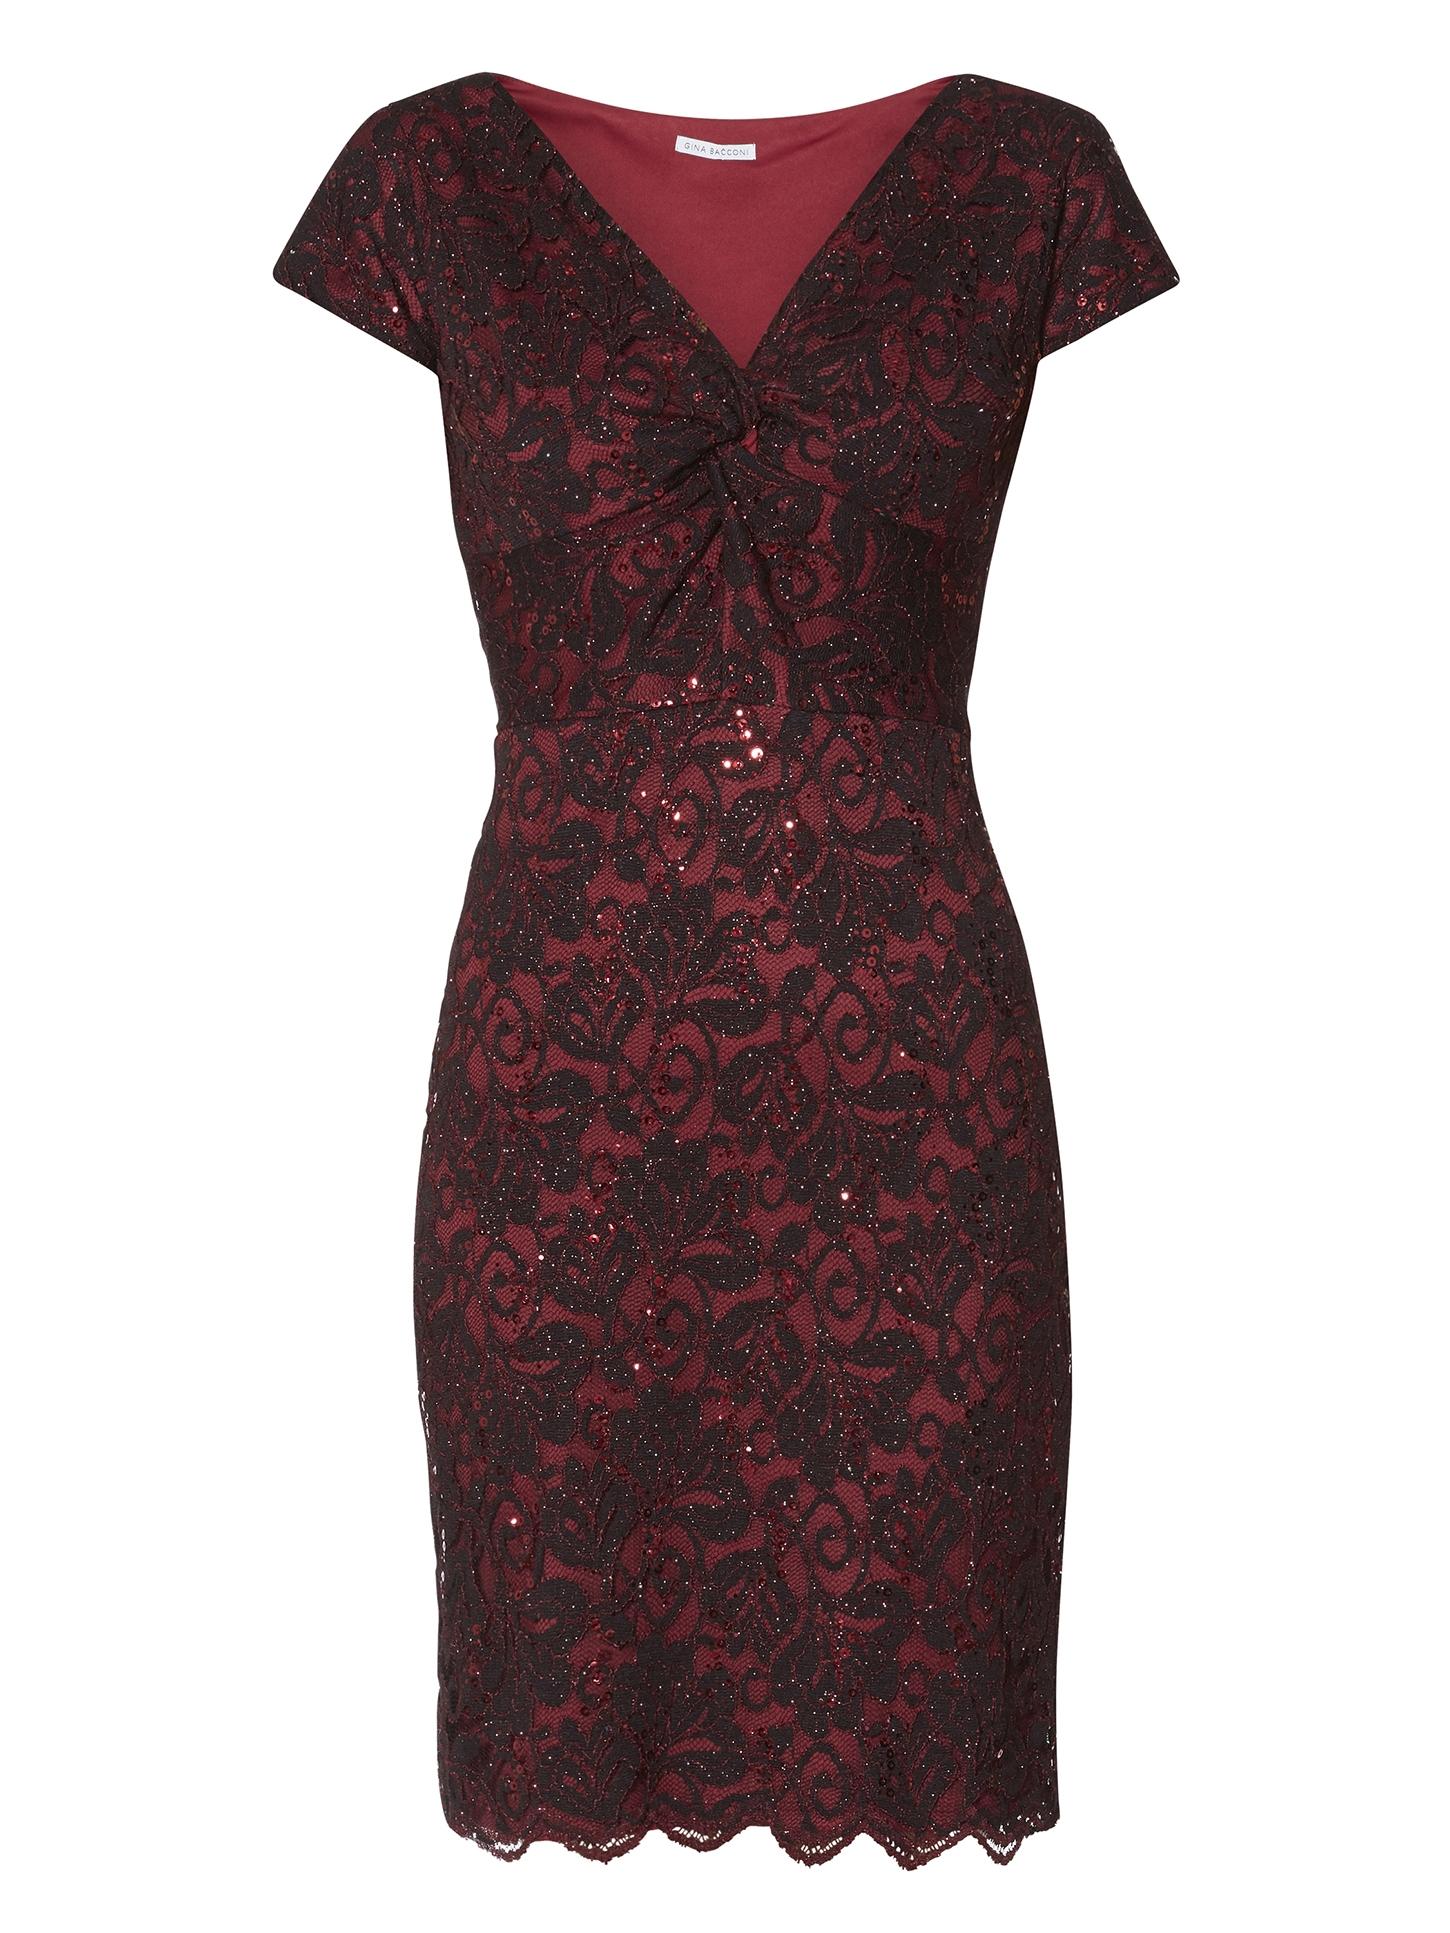 Samuella Stretch Lace Dress